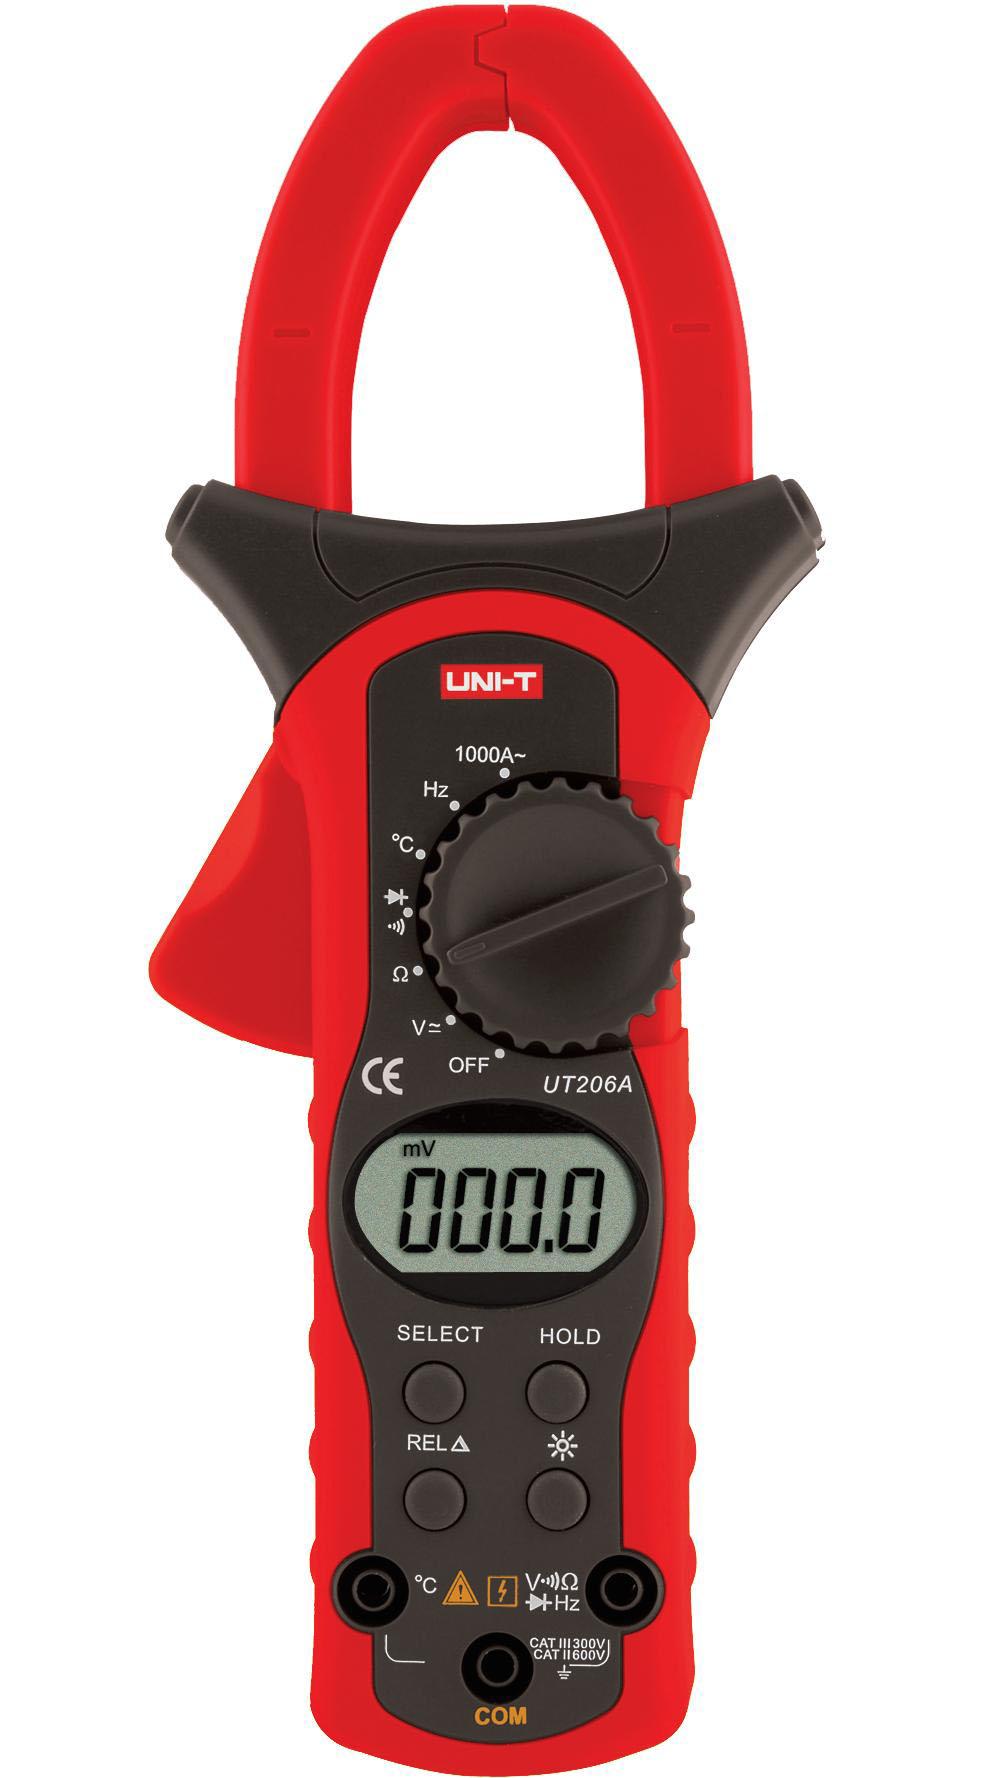 UNI-T UT206A - Digital Clamp Meters True RMS 1000A  (New); 400mV-600V